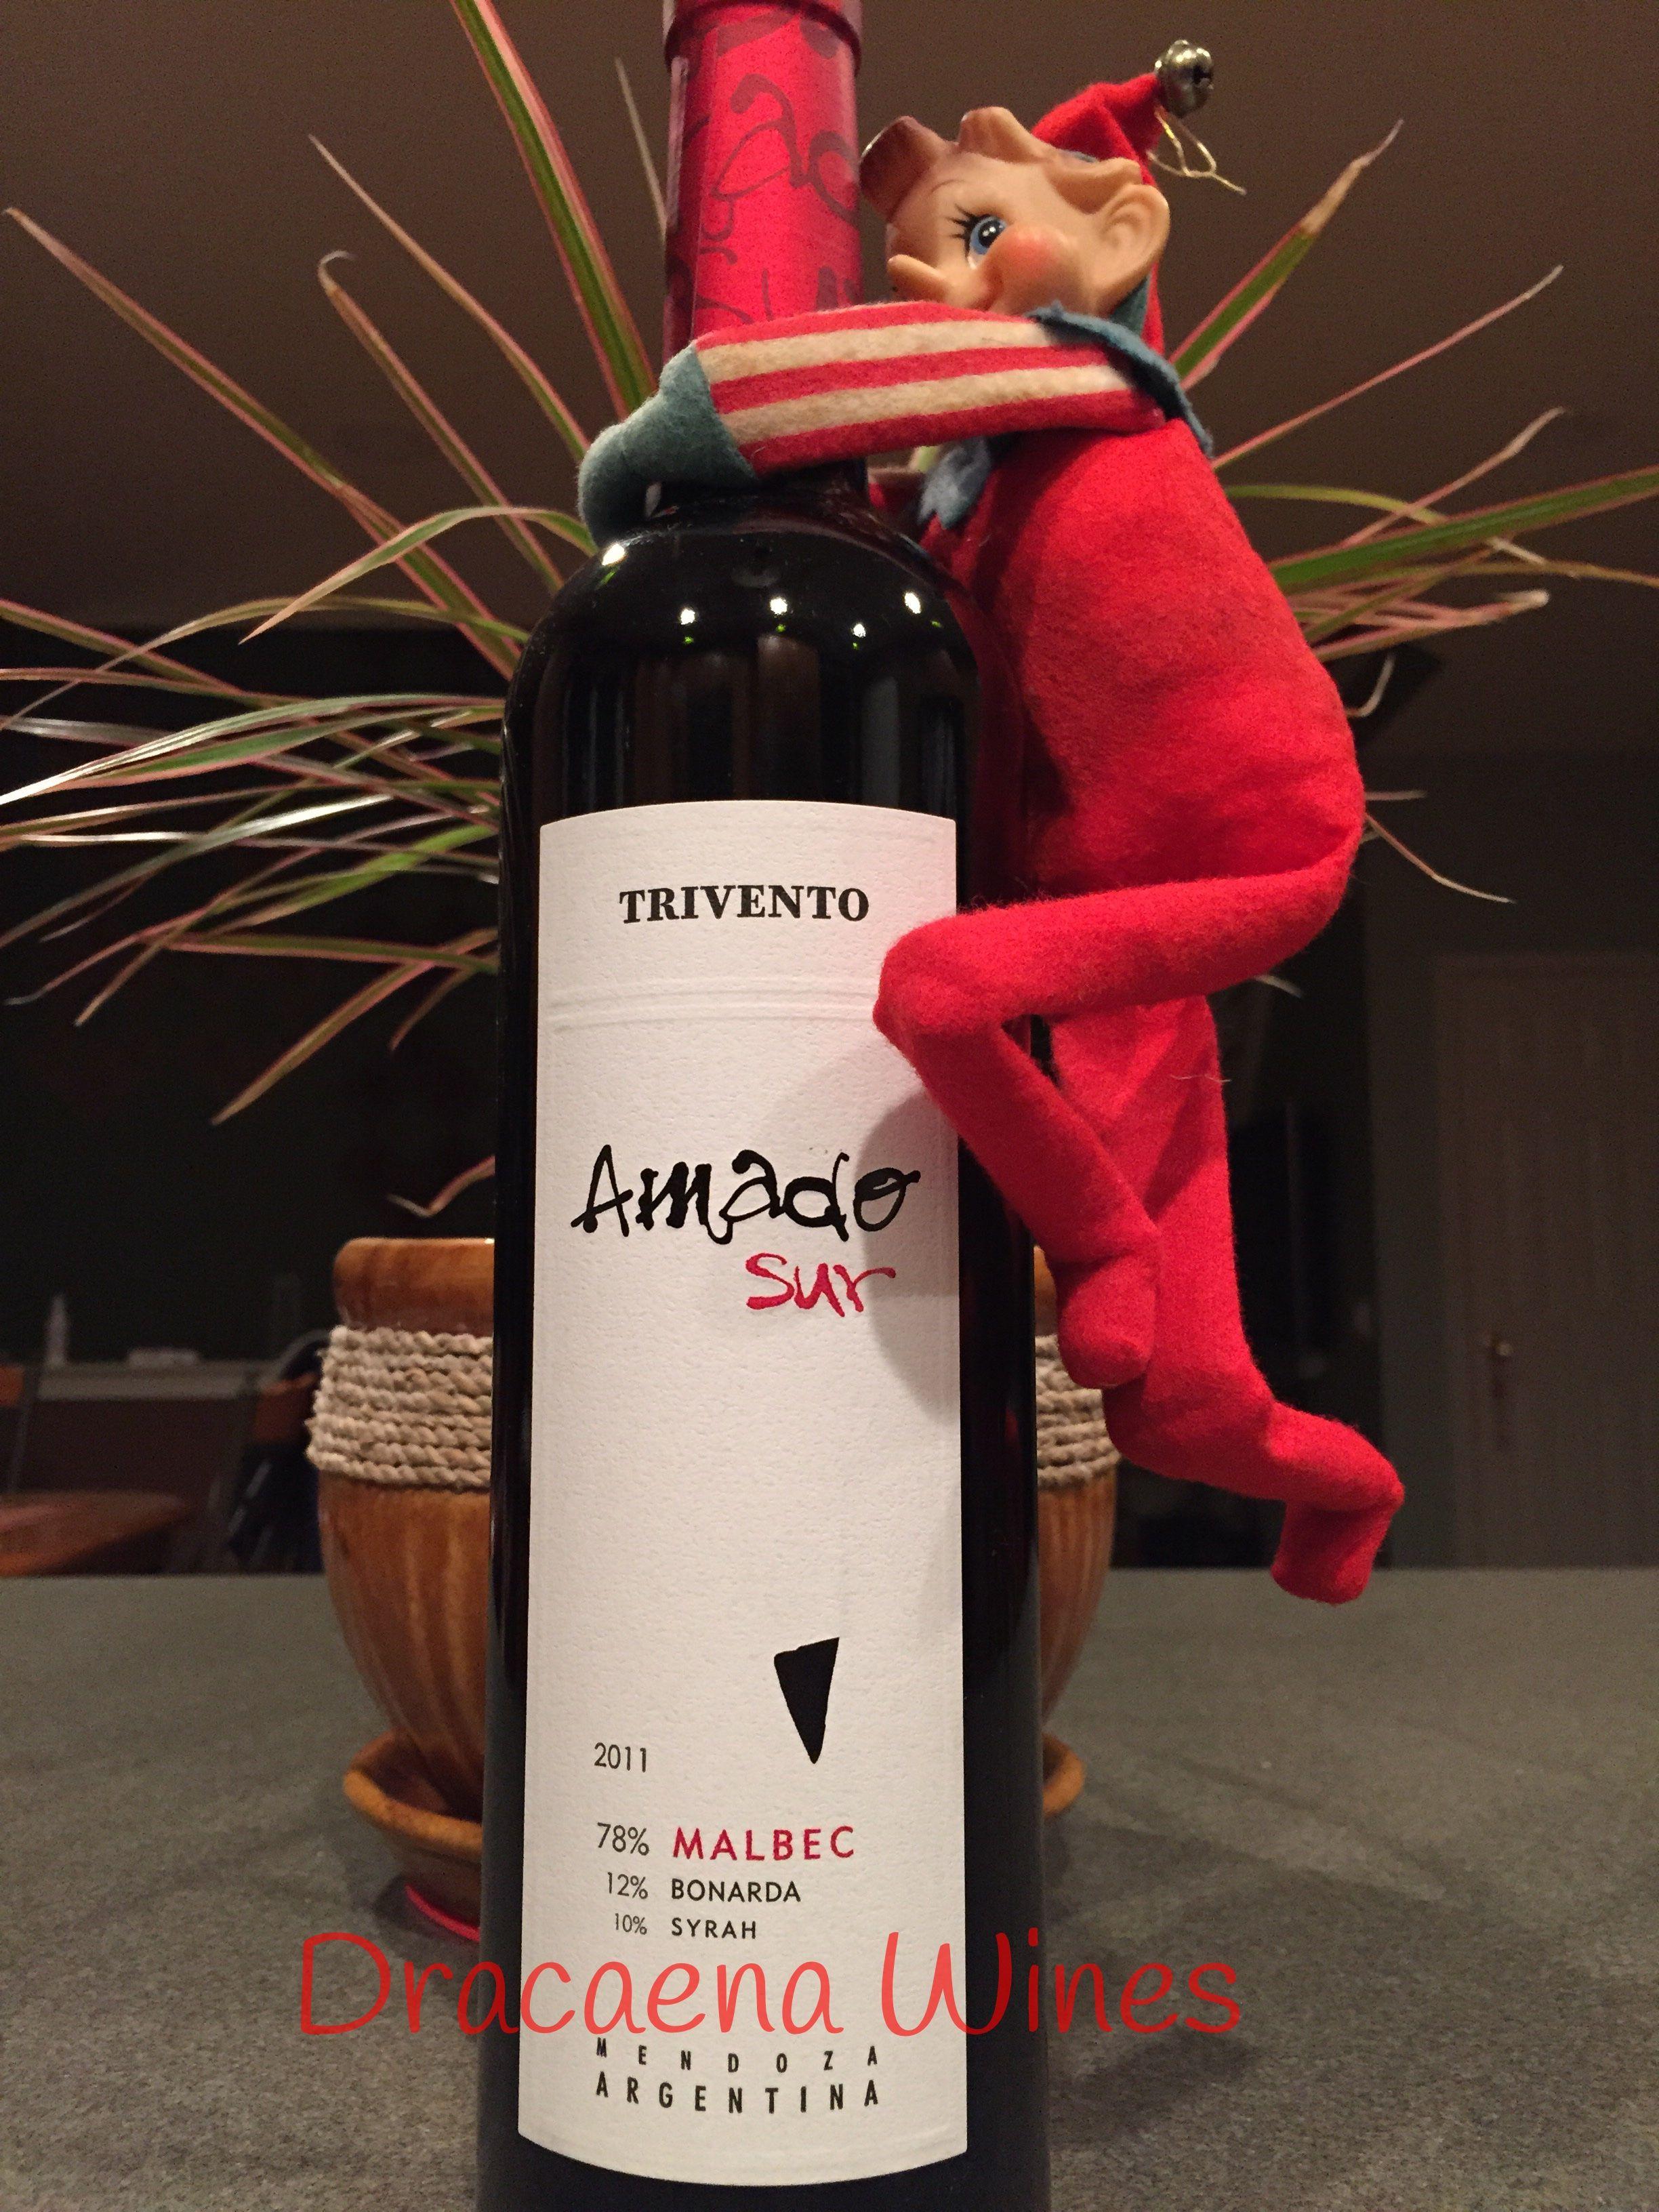 Malbec Amado Sur Trivento Wines Wine Wines Malbec Elf On The Shelf